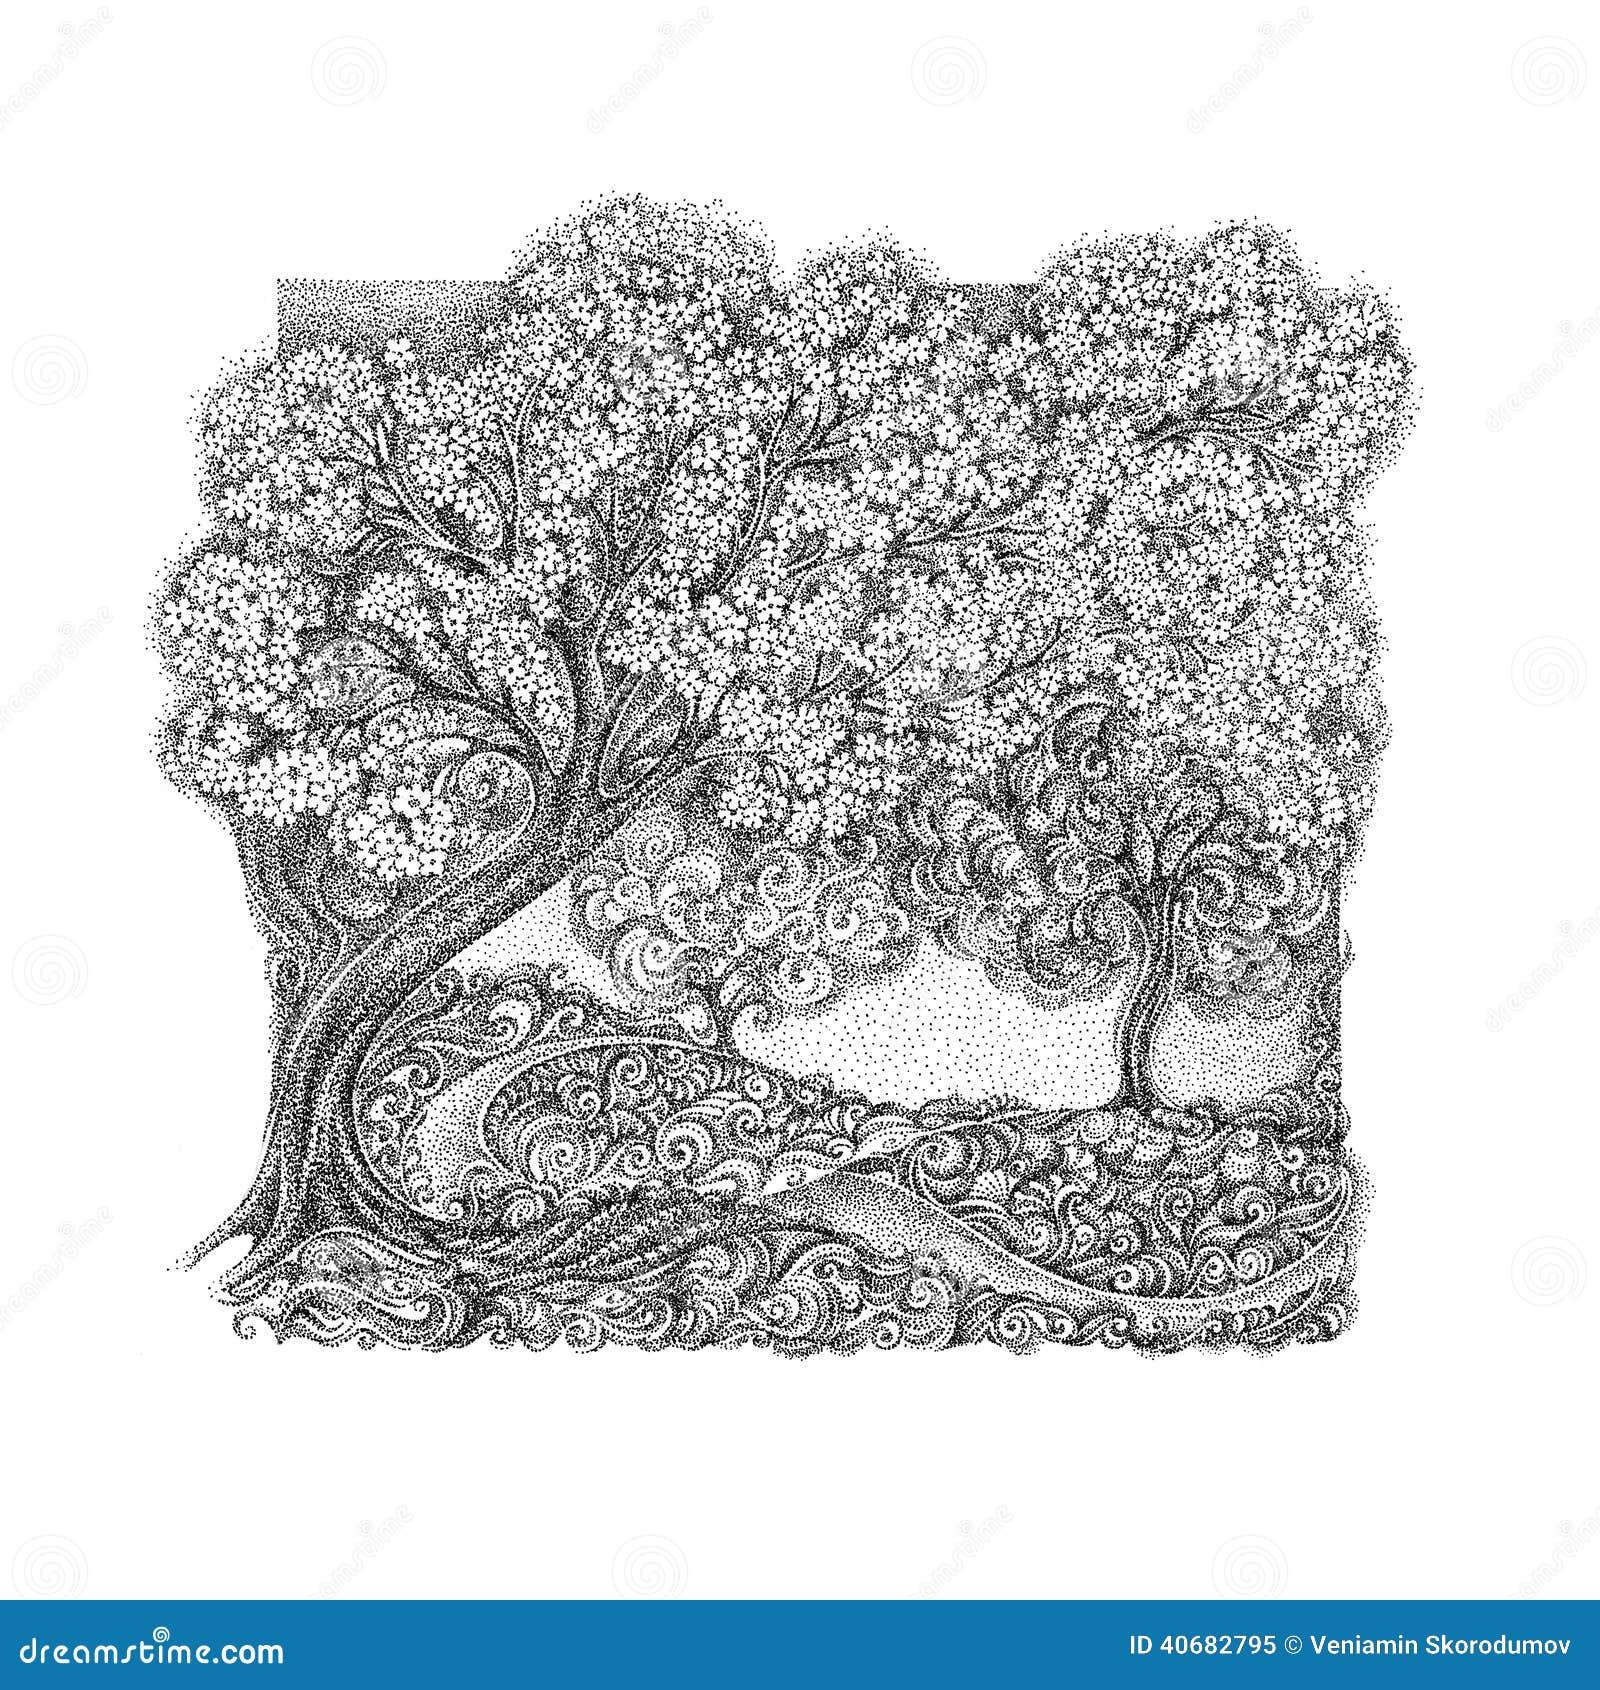 der kirschbaum stock illustrationen vektors klipart